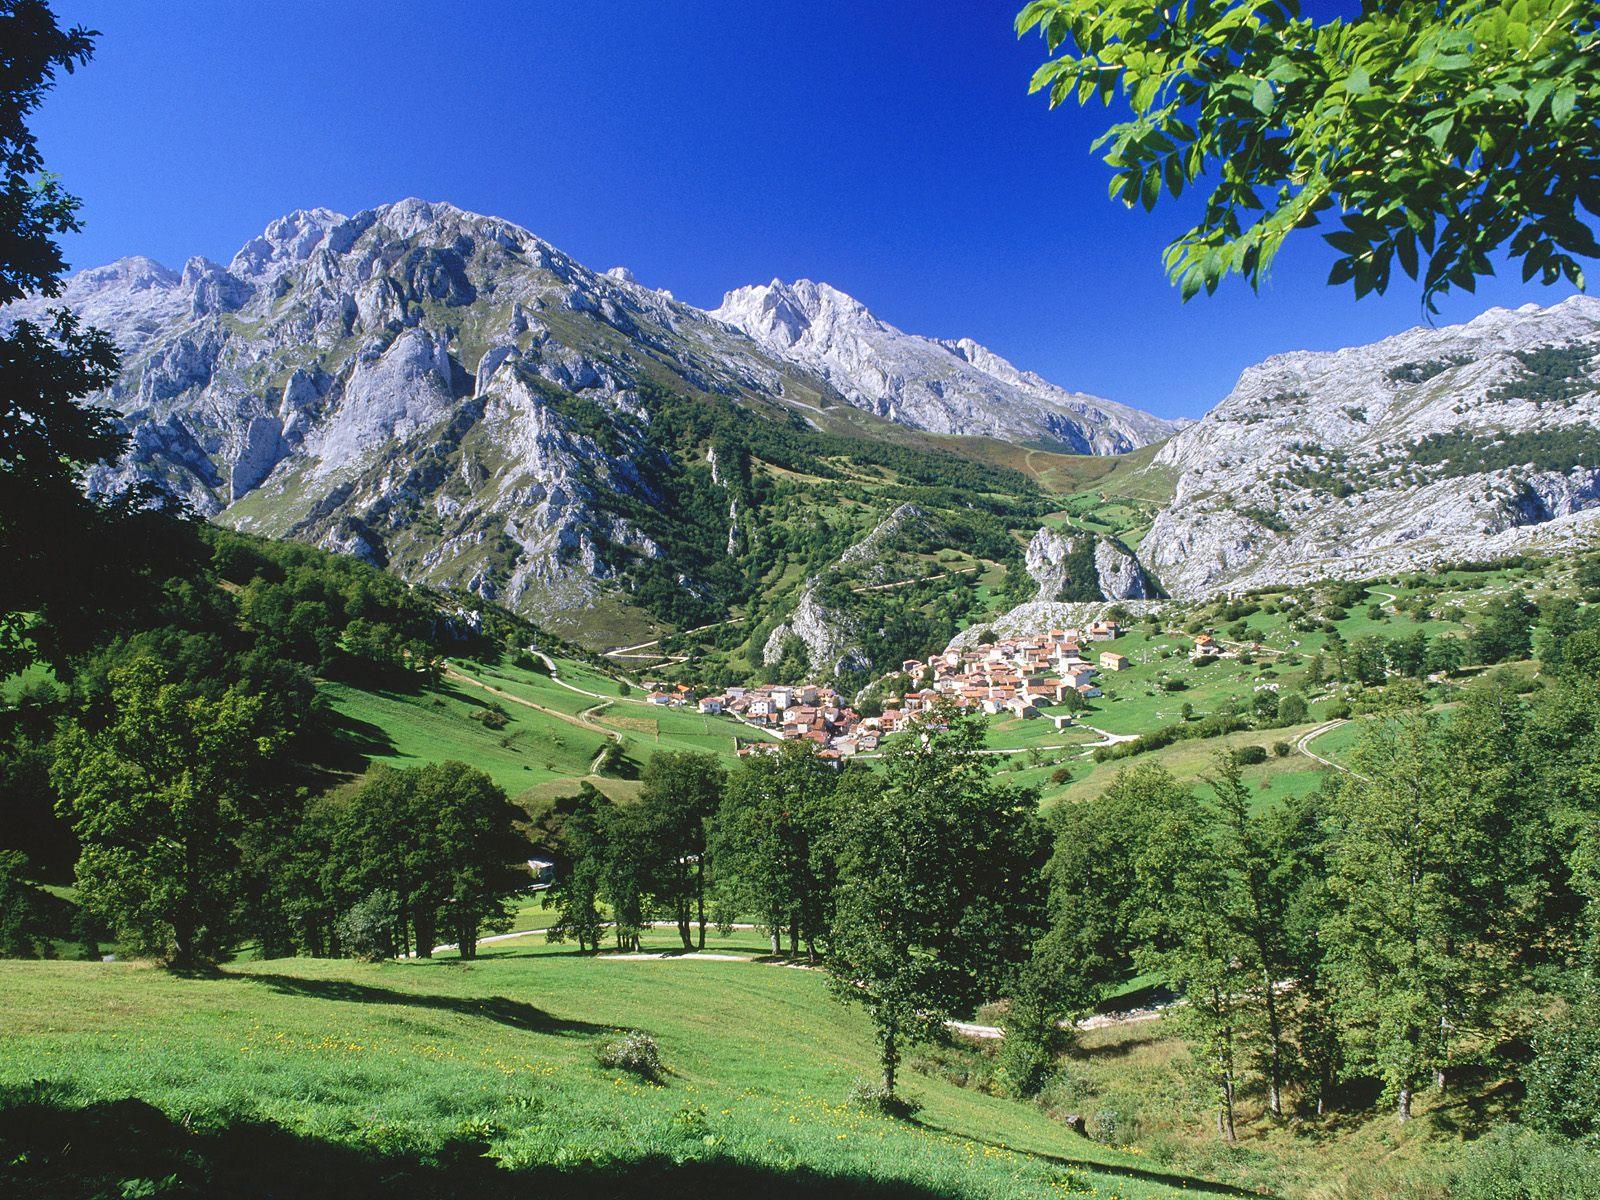 1600x1200 picos de europa national park desktop PC and Mac wallpaper 1600x1200